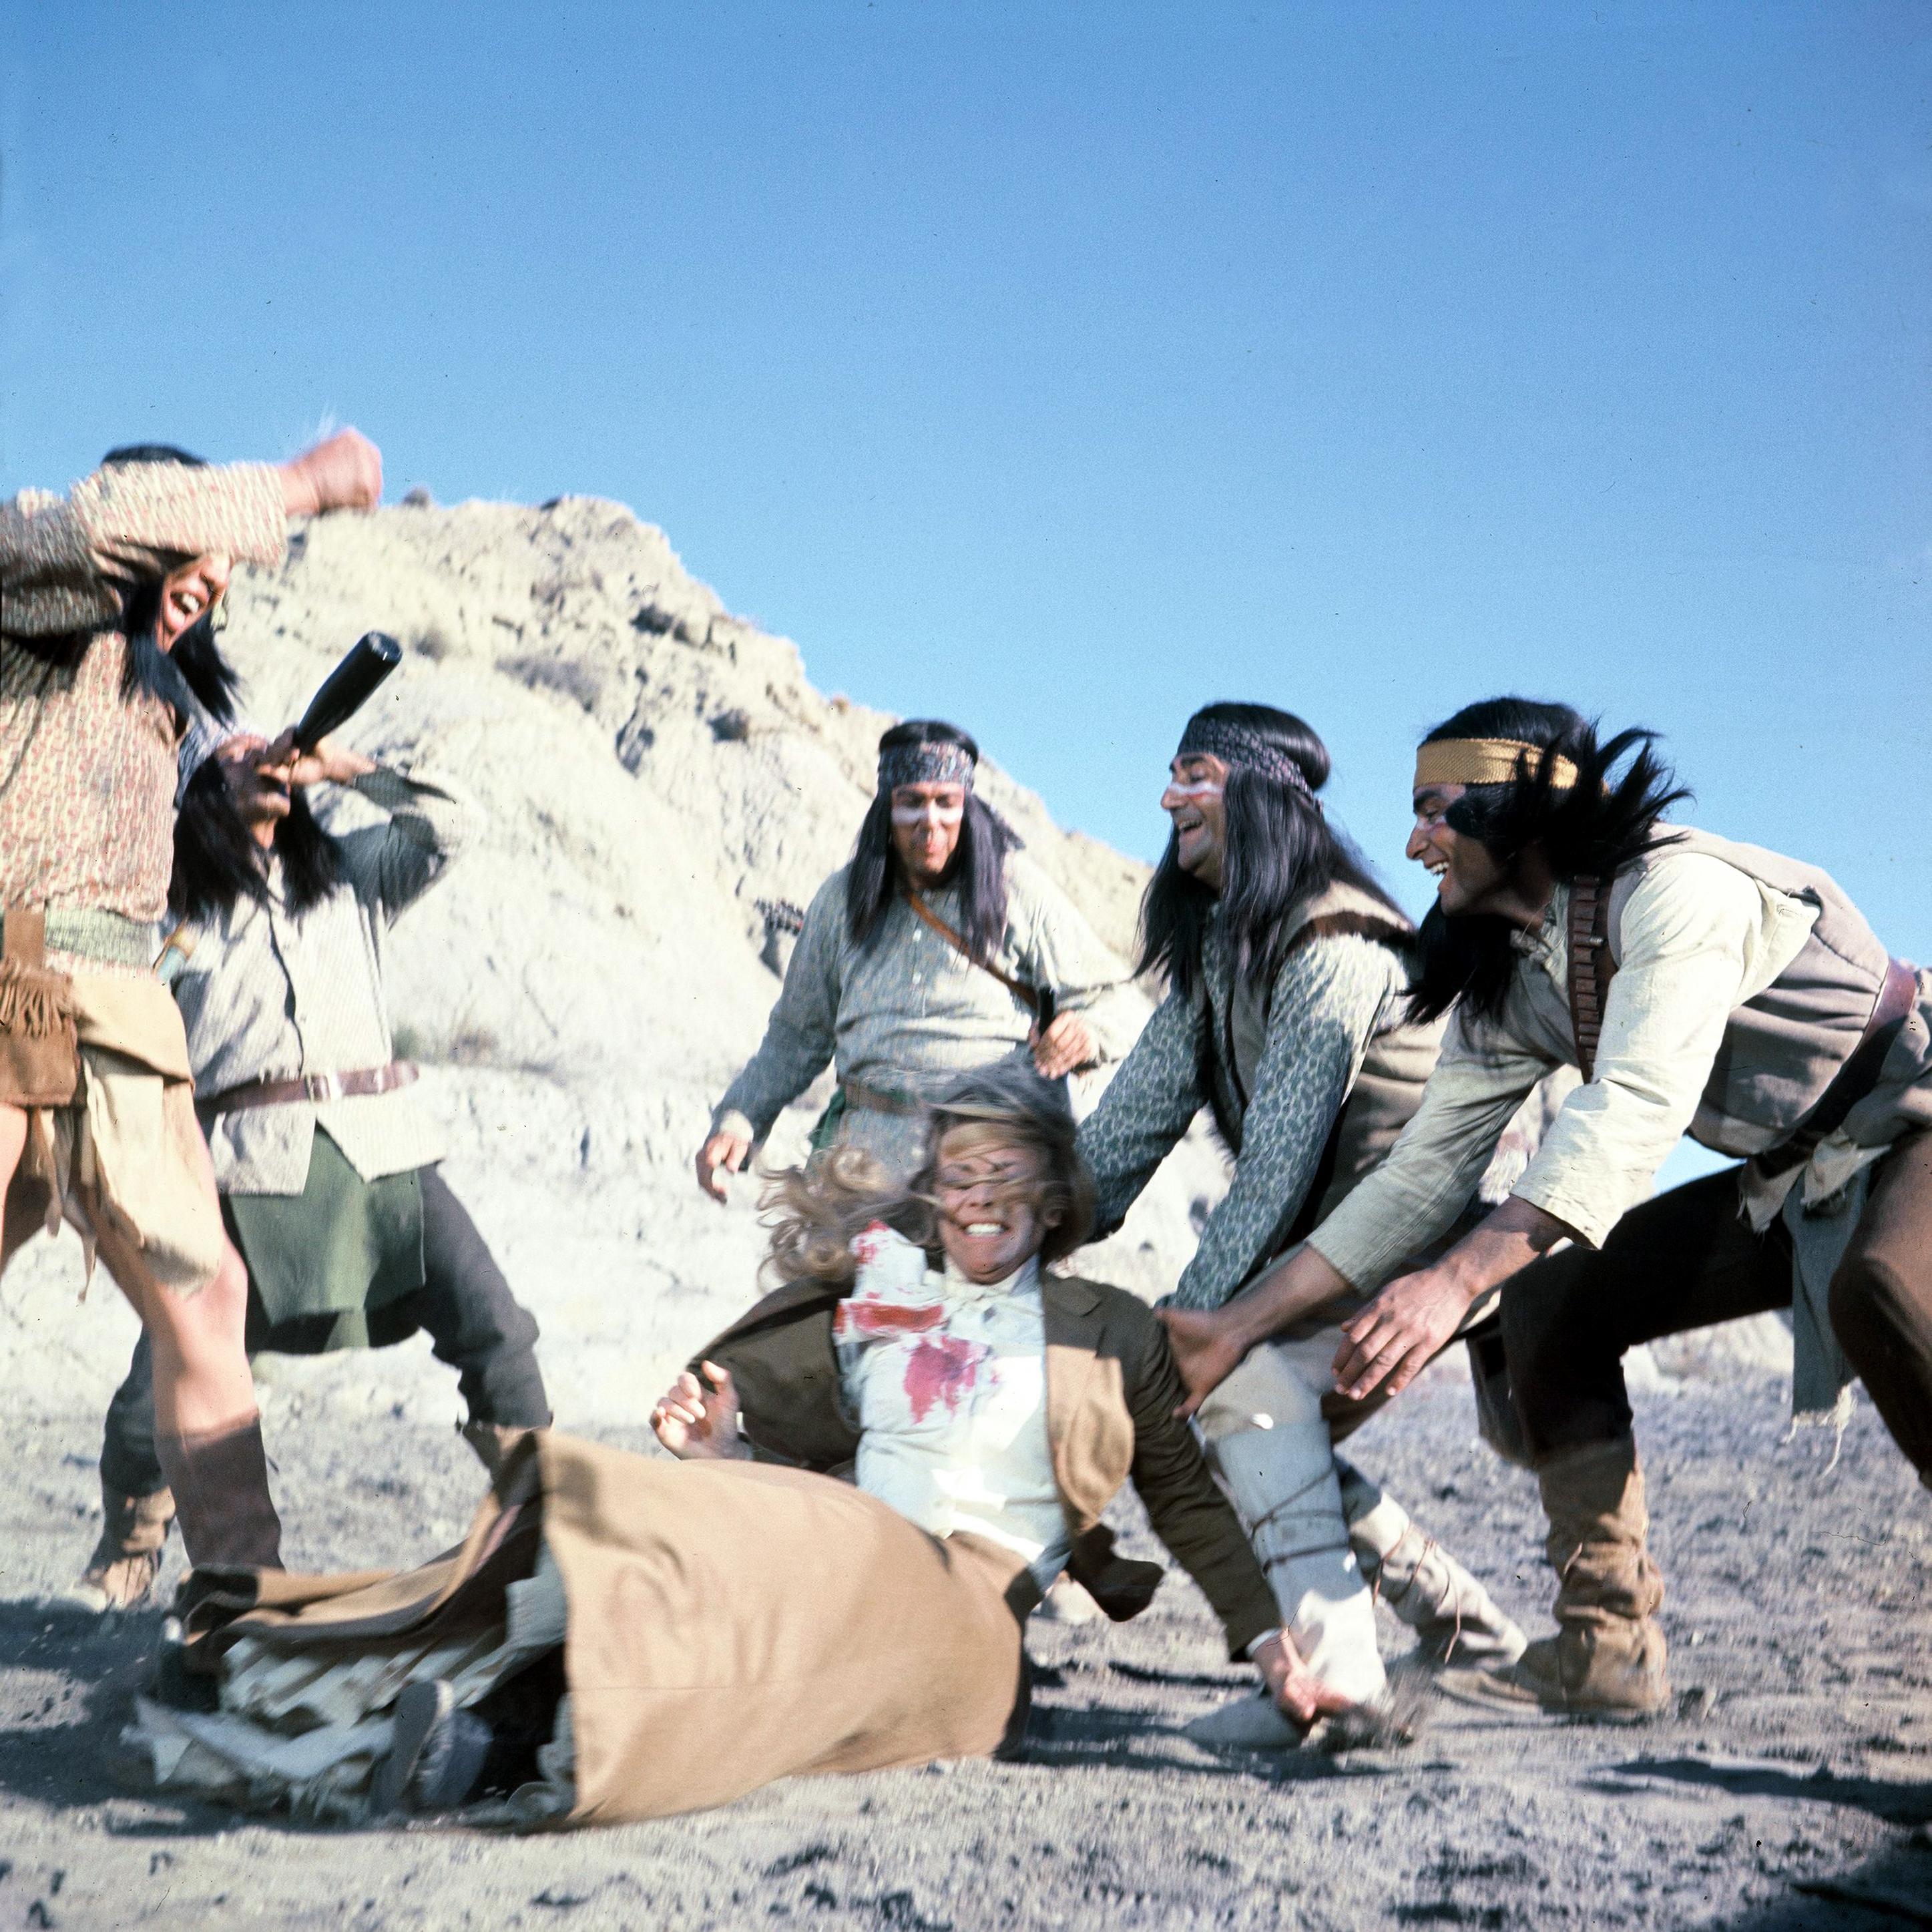 tailles S-5XL Shalako T-shirt homme G0451 100/% coton film en 1968,OLD western